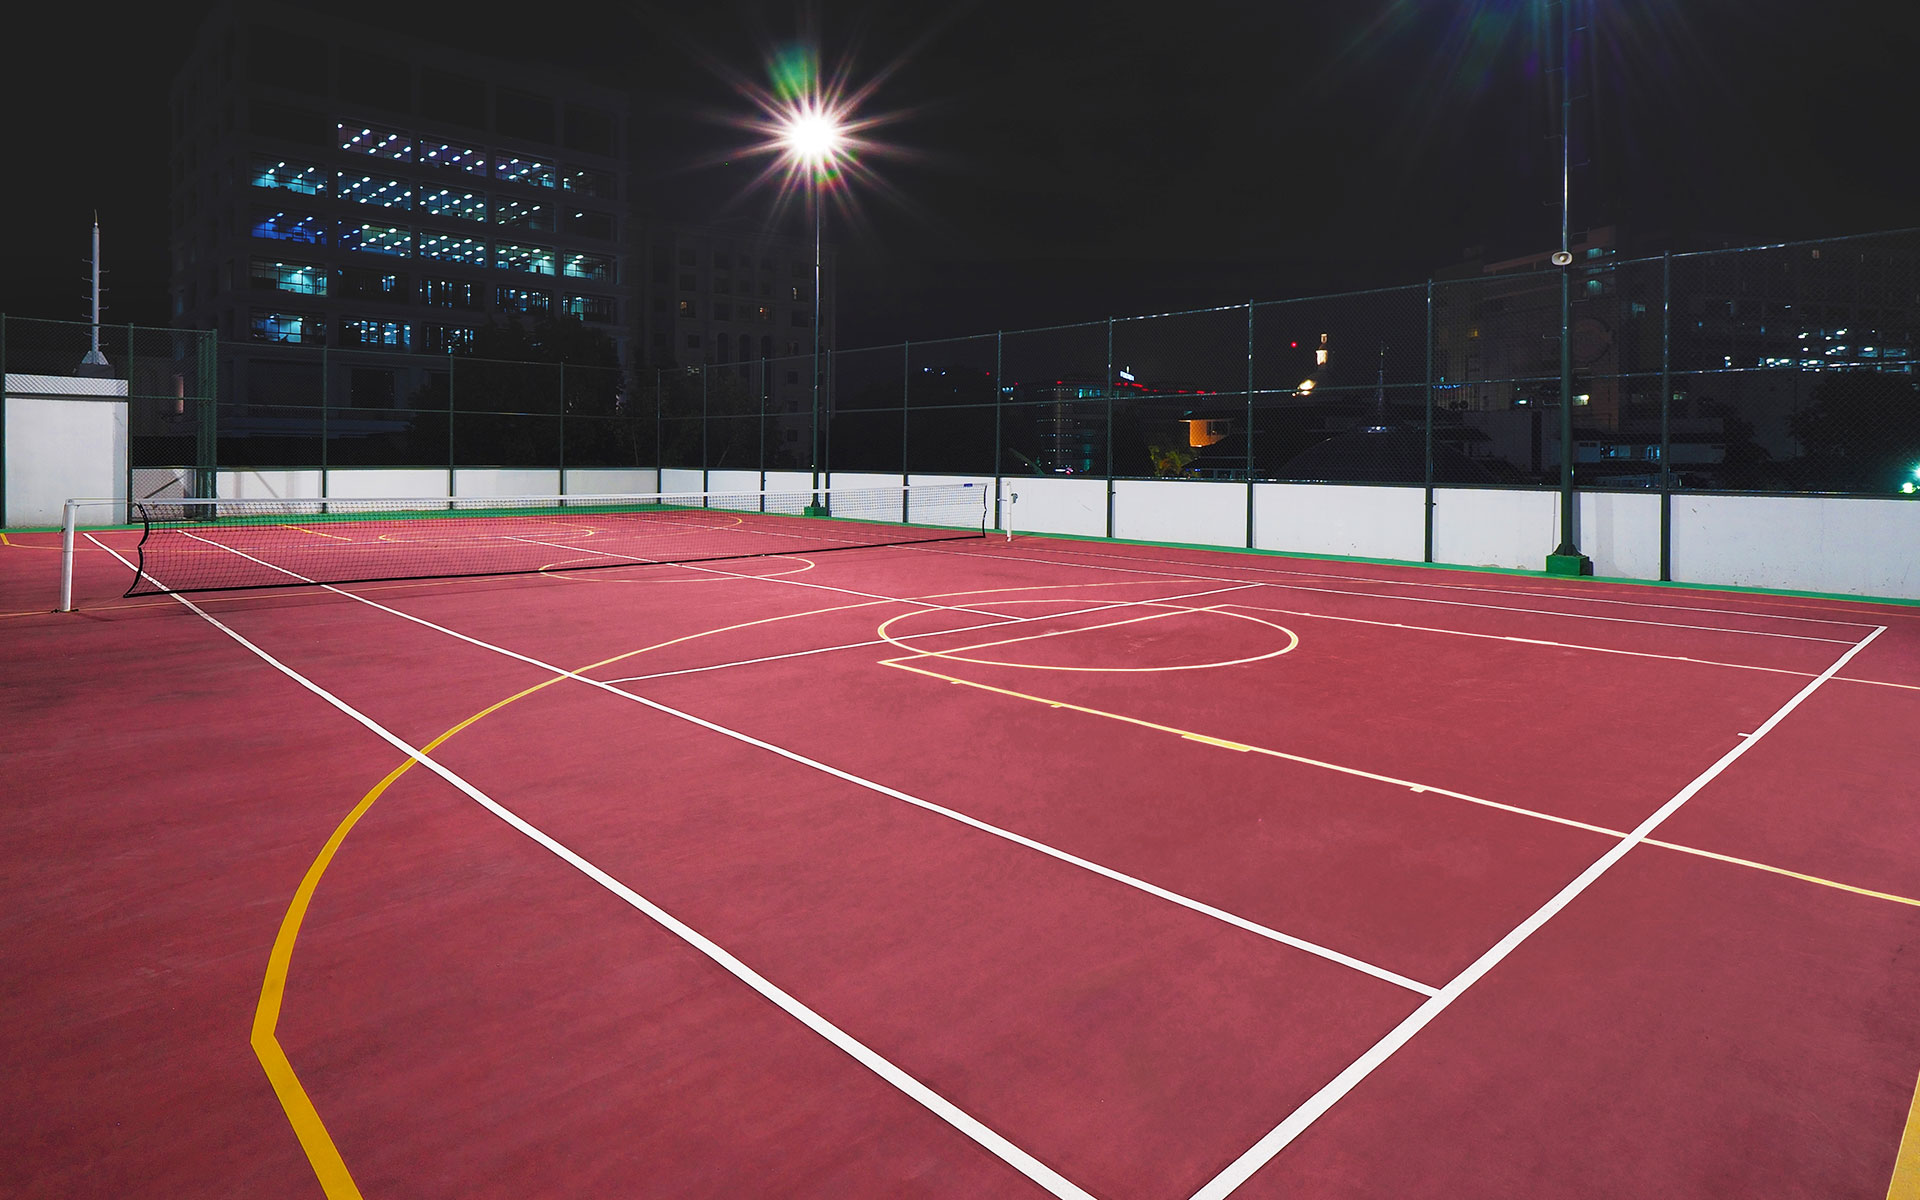 Vasaka The Reiz Condo - Reiz Sport Court